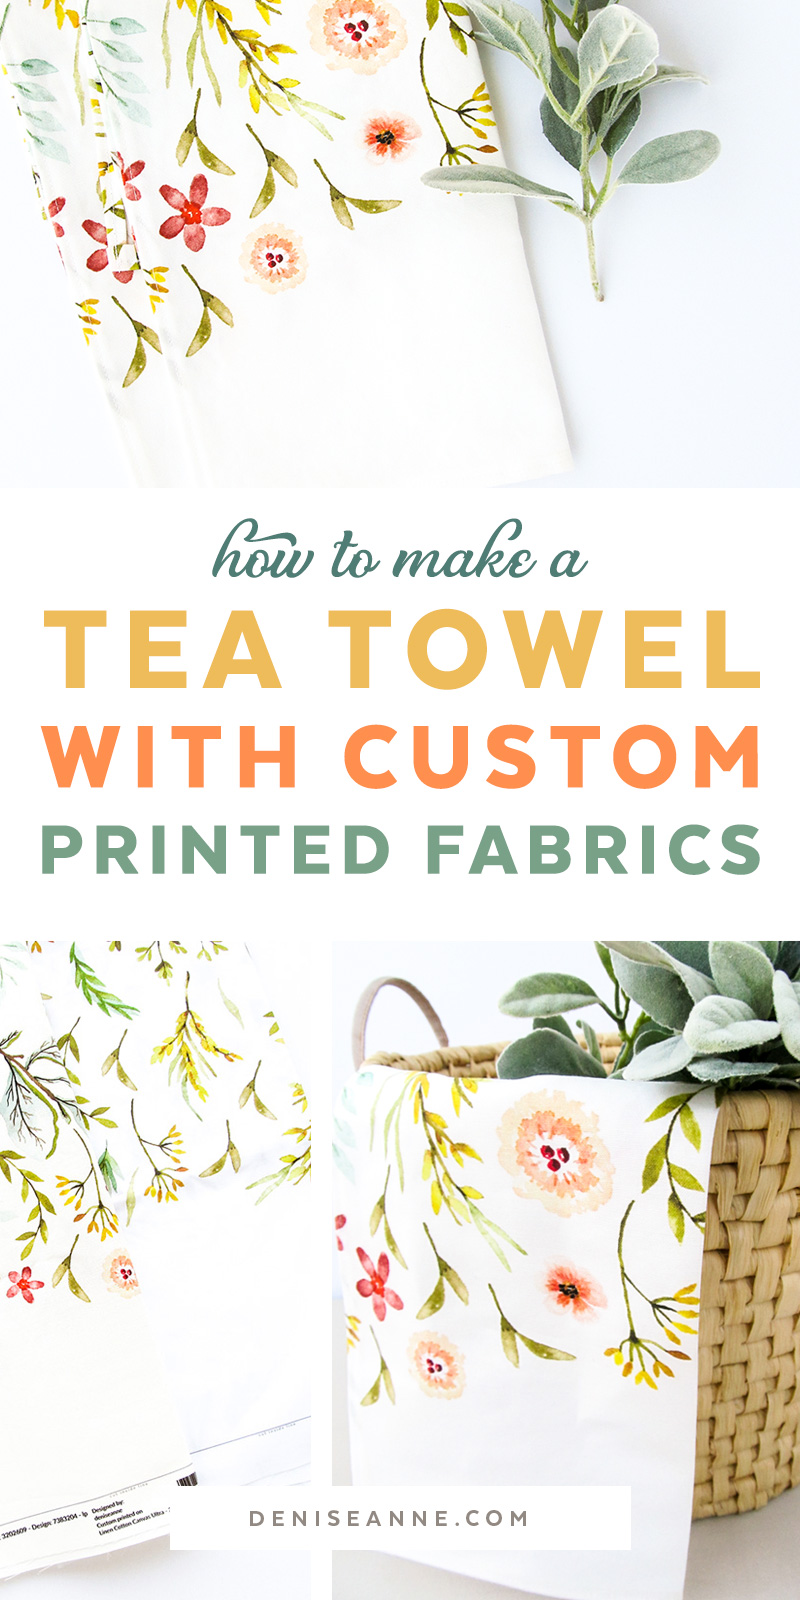 How to make a tea towel using custom printed fabrics — Denise Anne